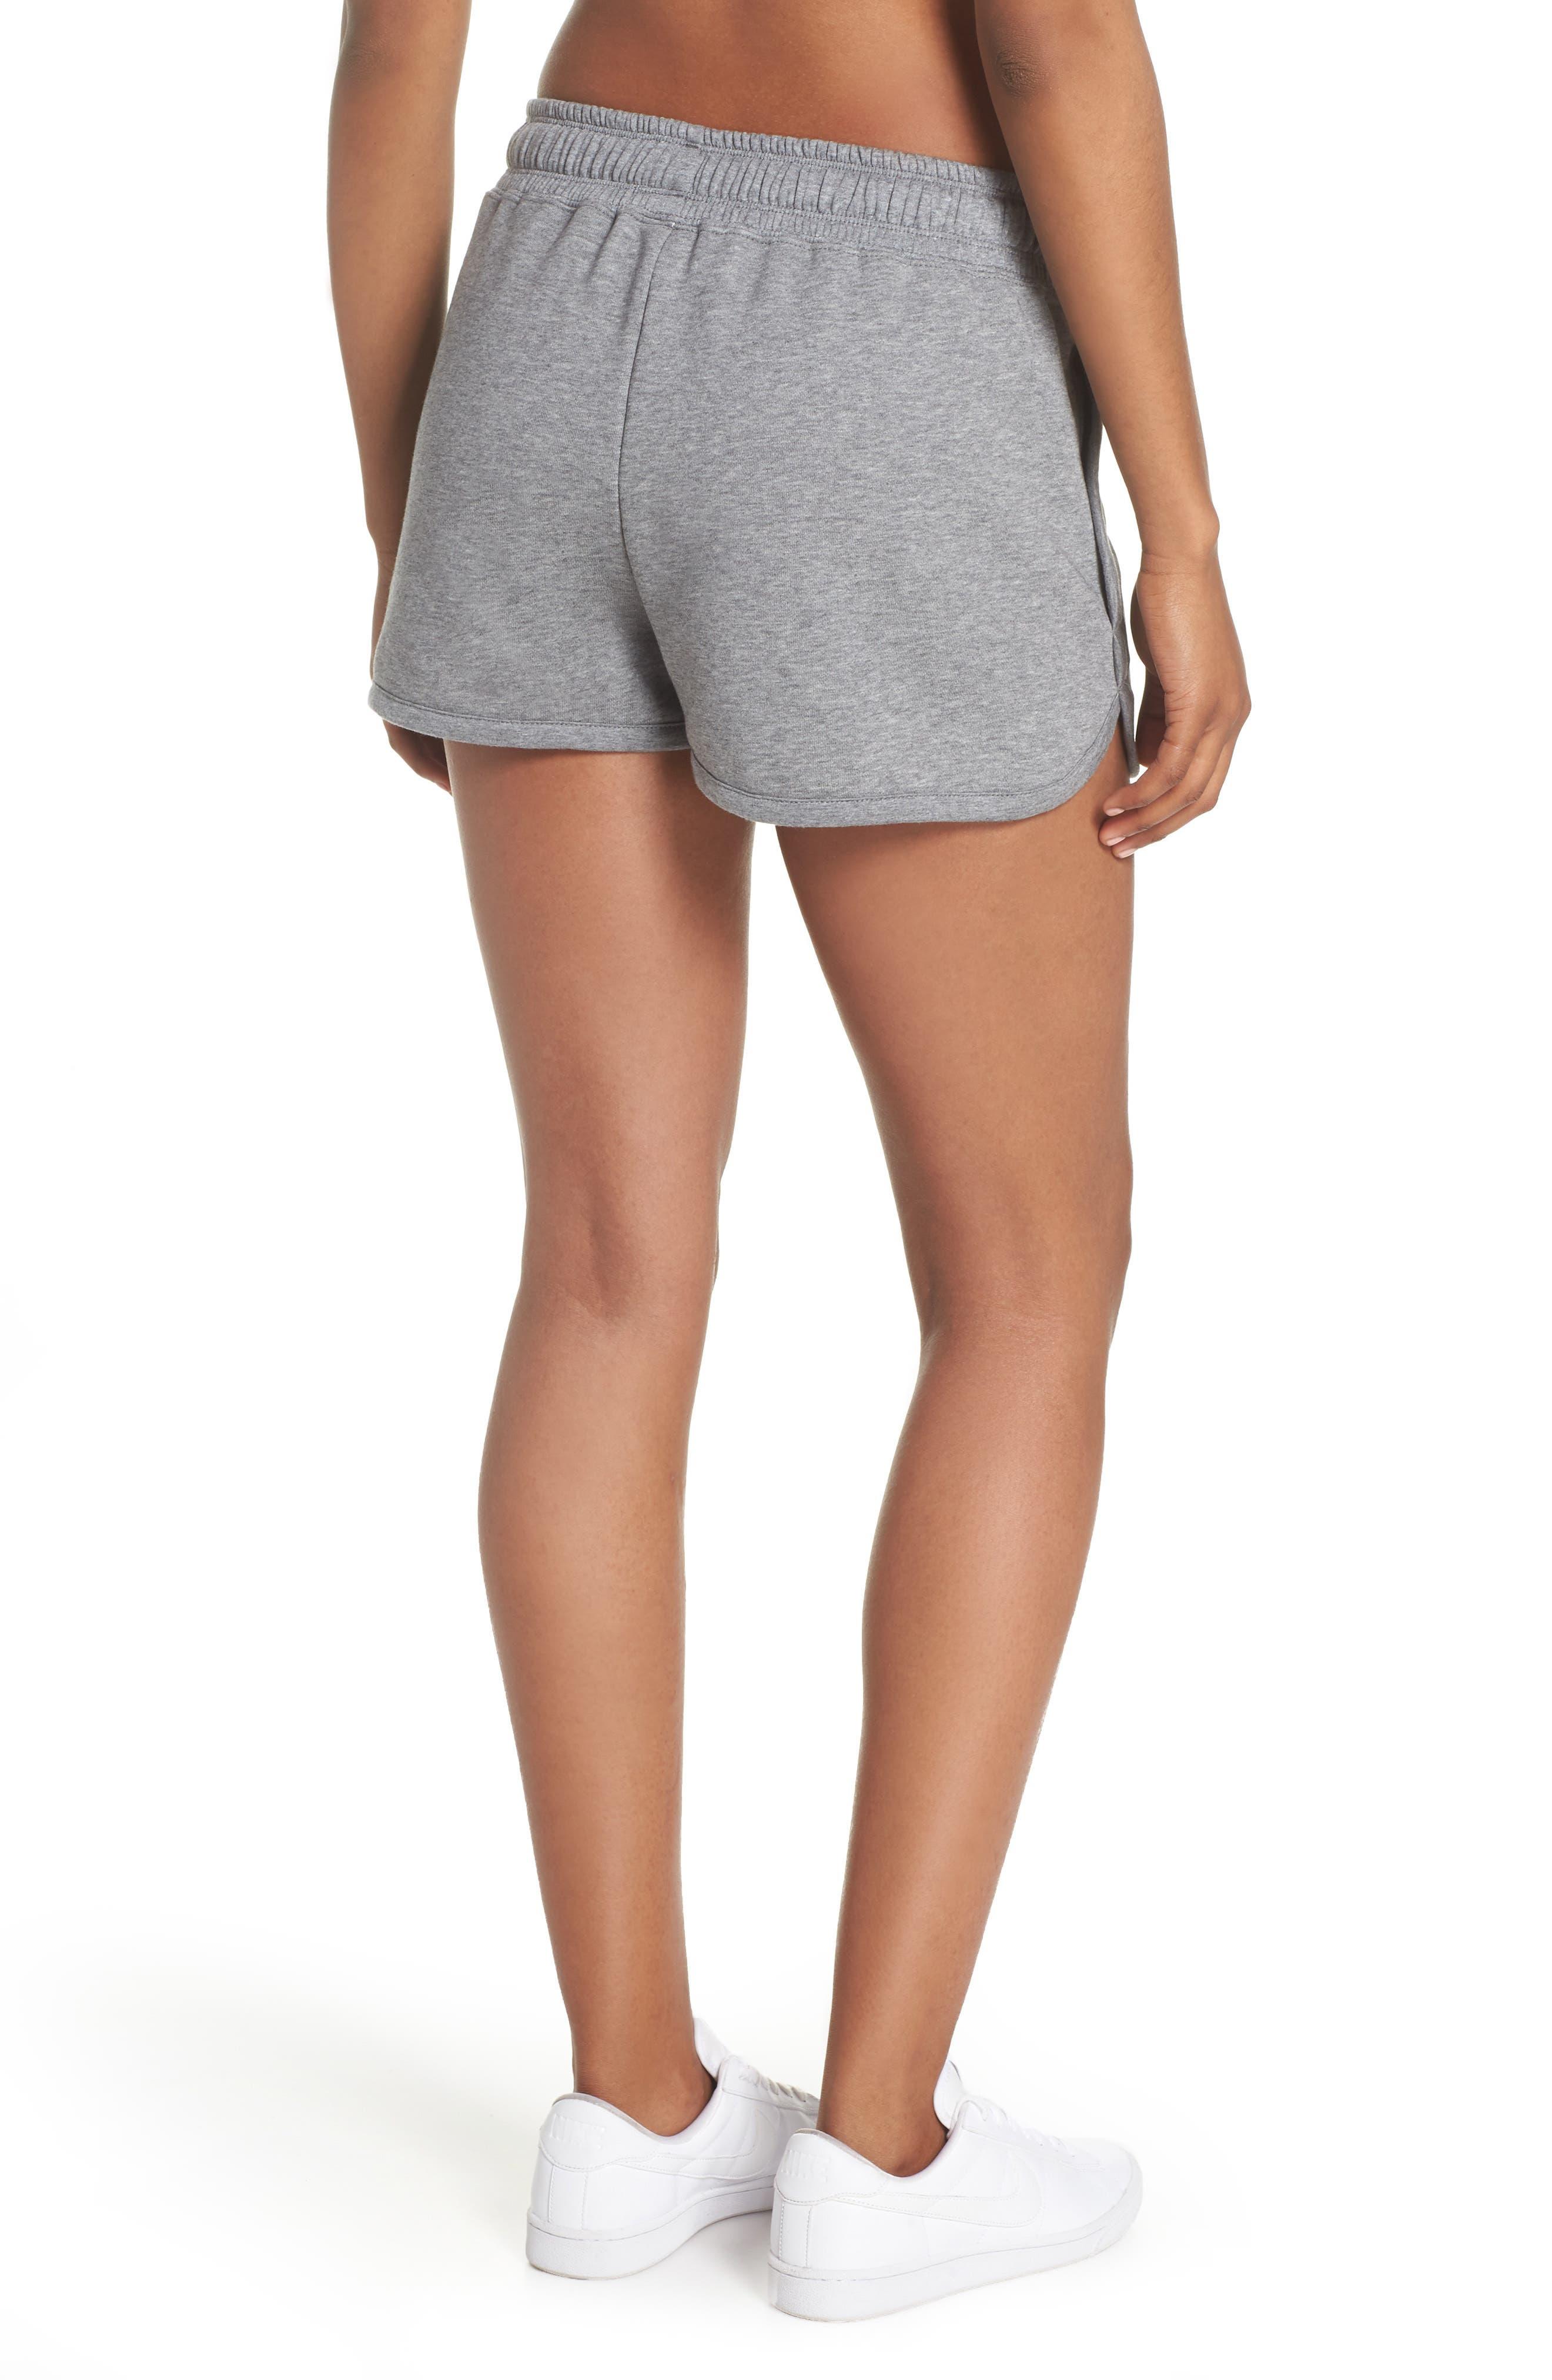 Sportswear Air Gym Shorts,                             Alternate thumbnail 2, color,                             Carbon Heather/ White/ Black